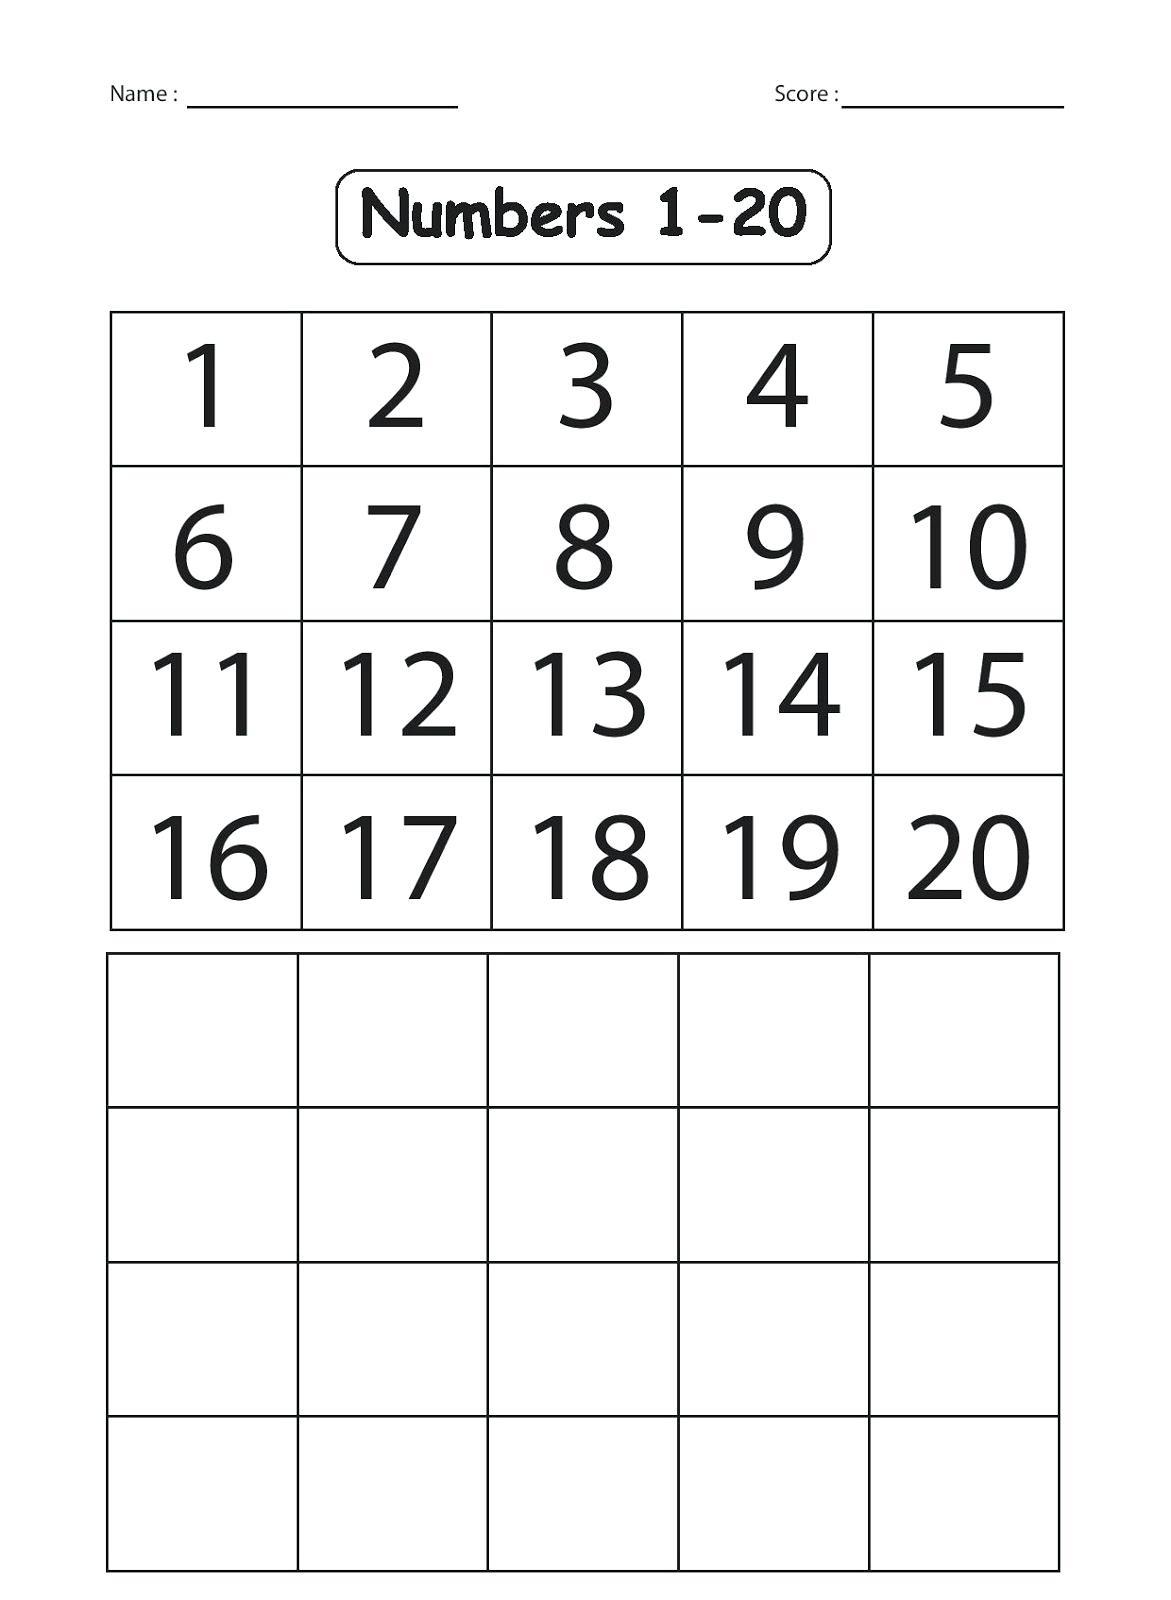 Ice Cream Missing Numbers 1 20 Worksheet For Kindergarten